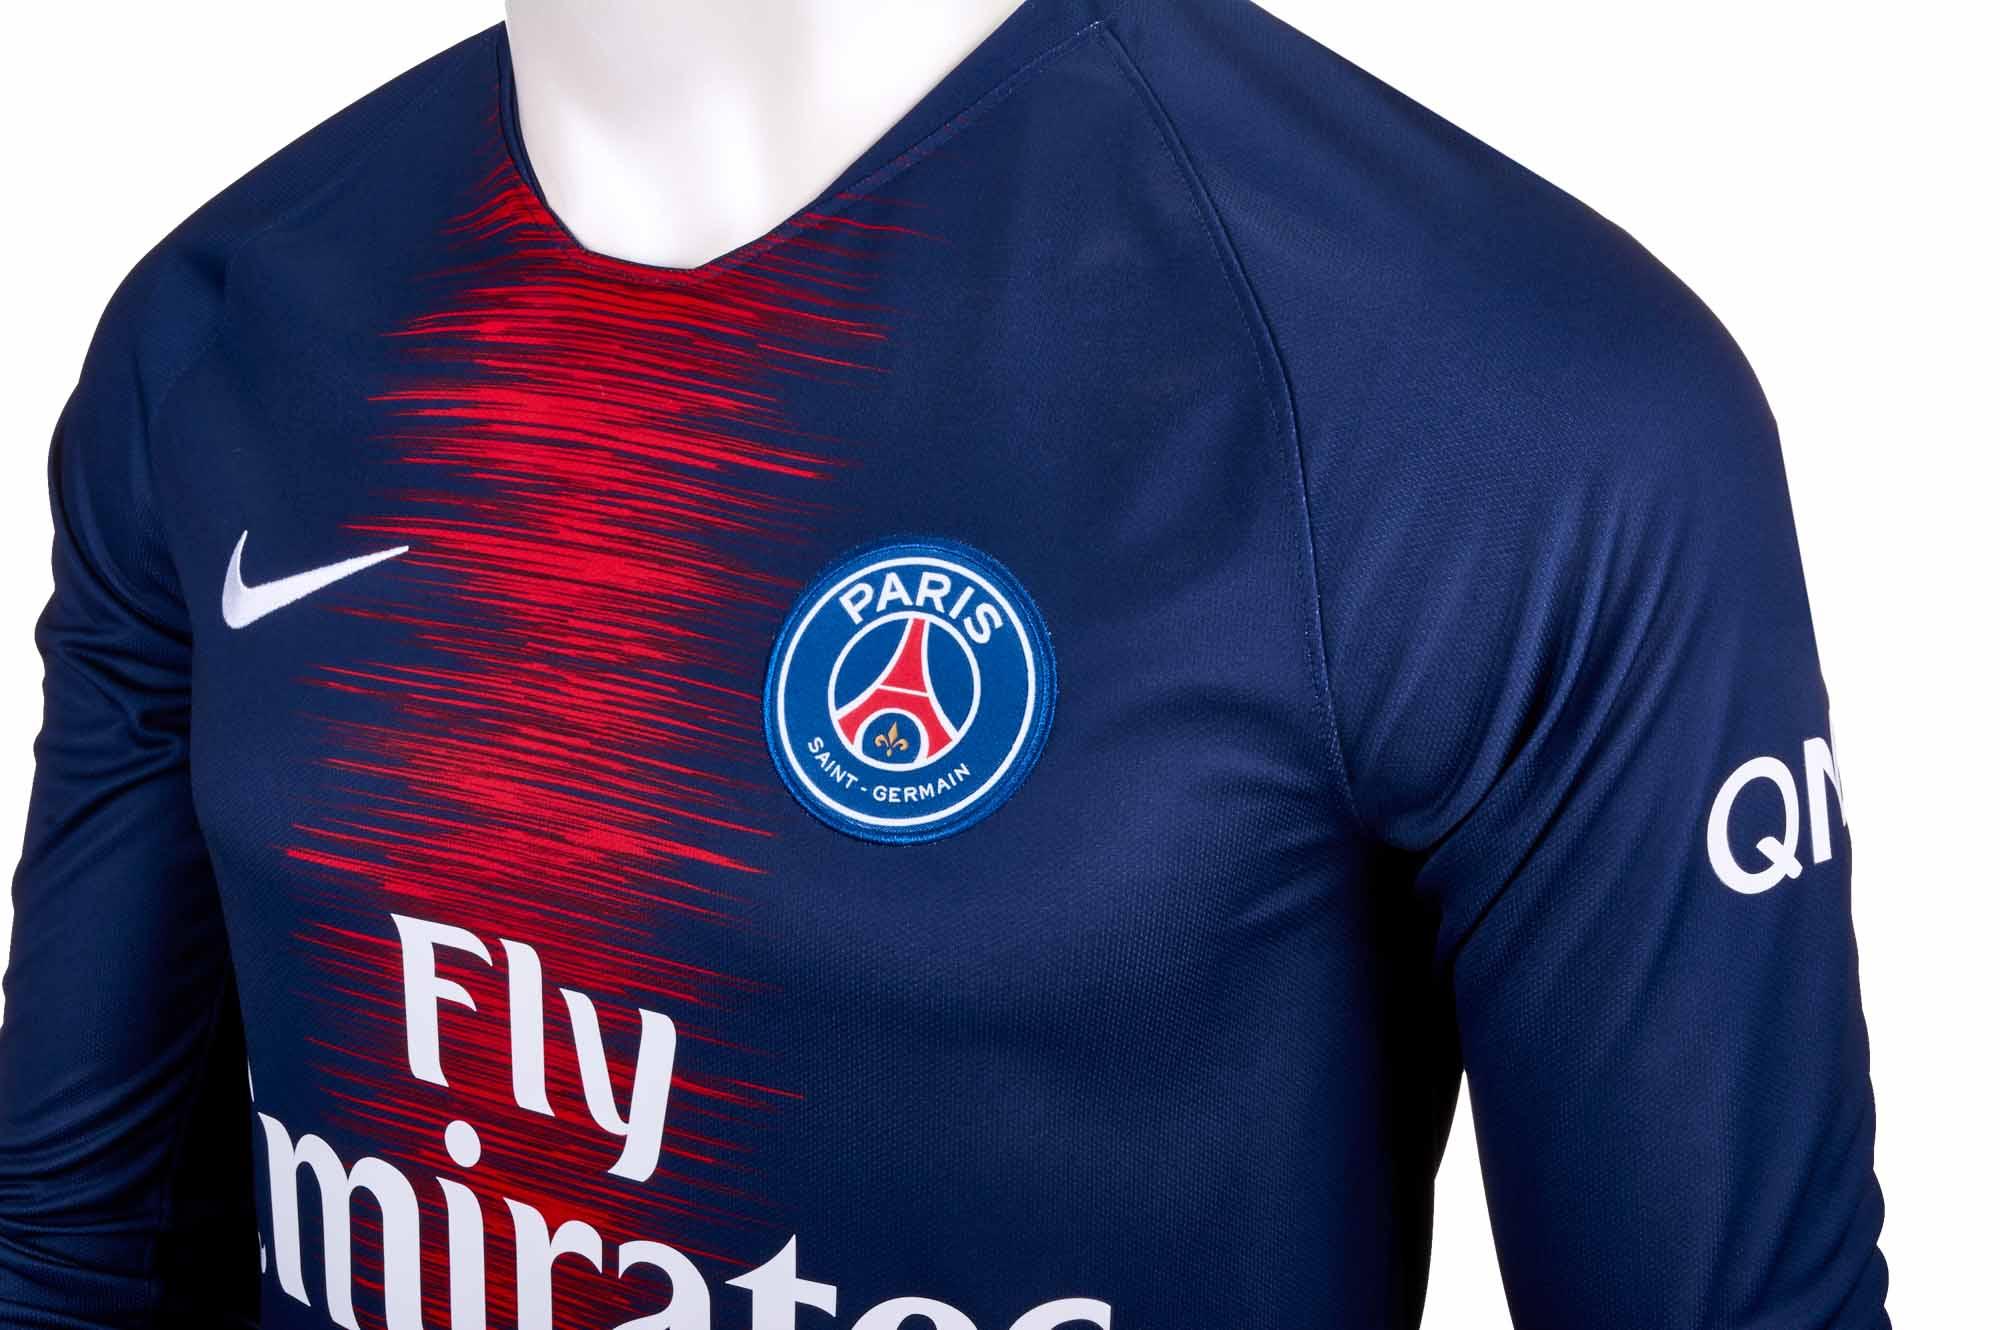 ffccc8d4cc0 Nike Kylian Mbappe PSG Home L S Jersey 2018-19 - Cleatsxp